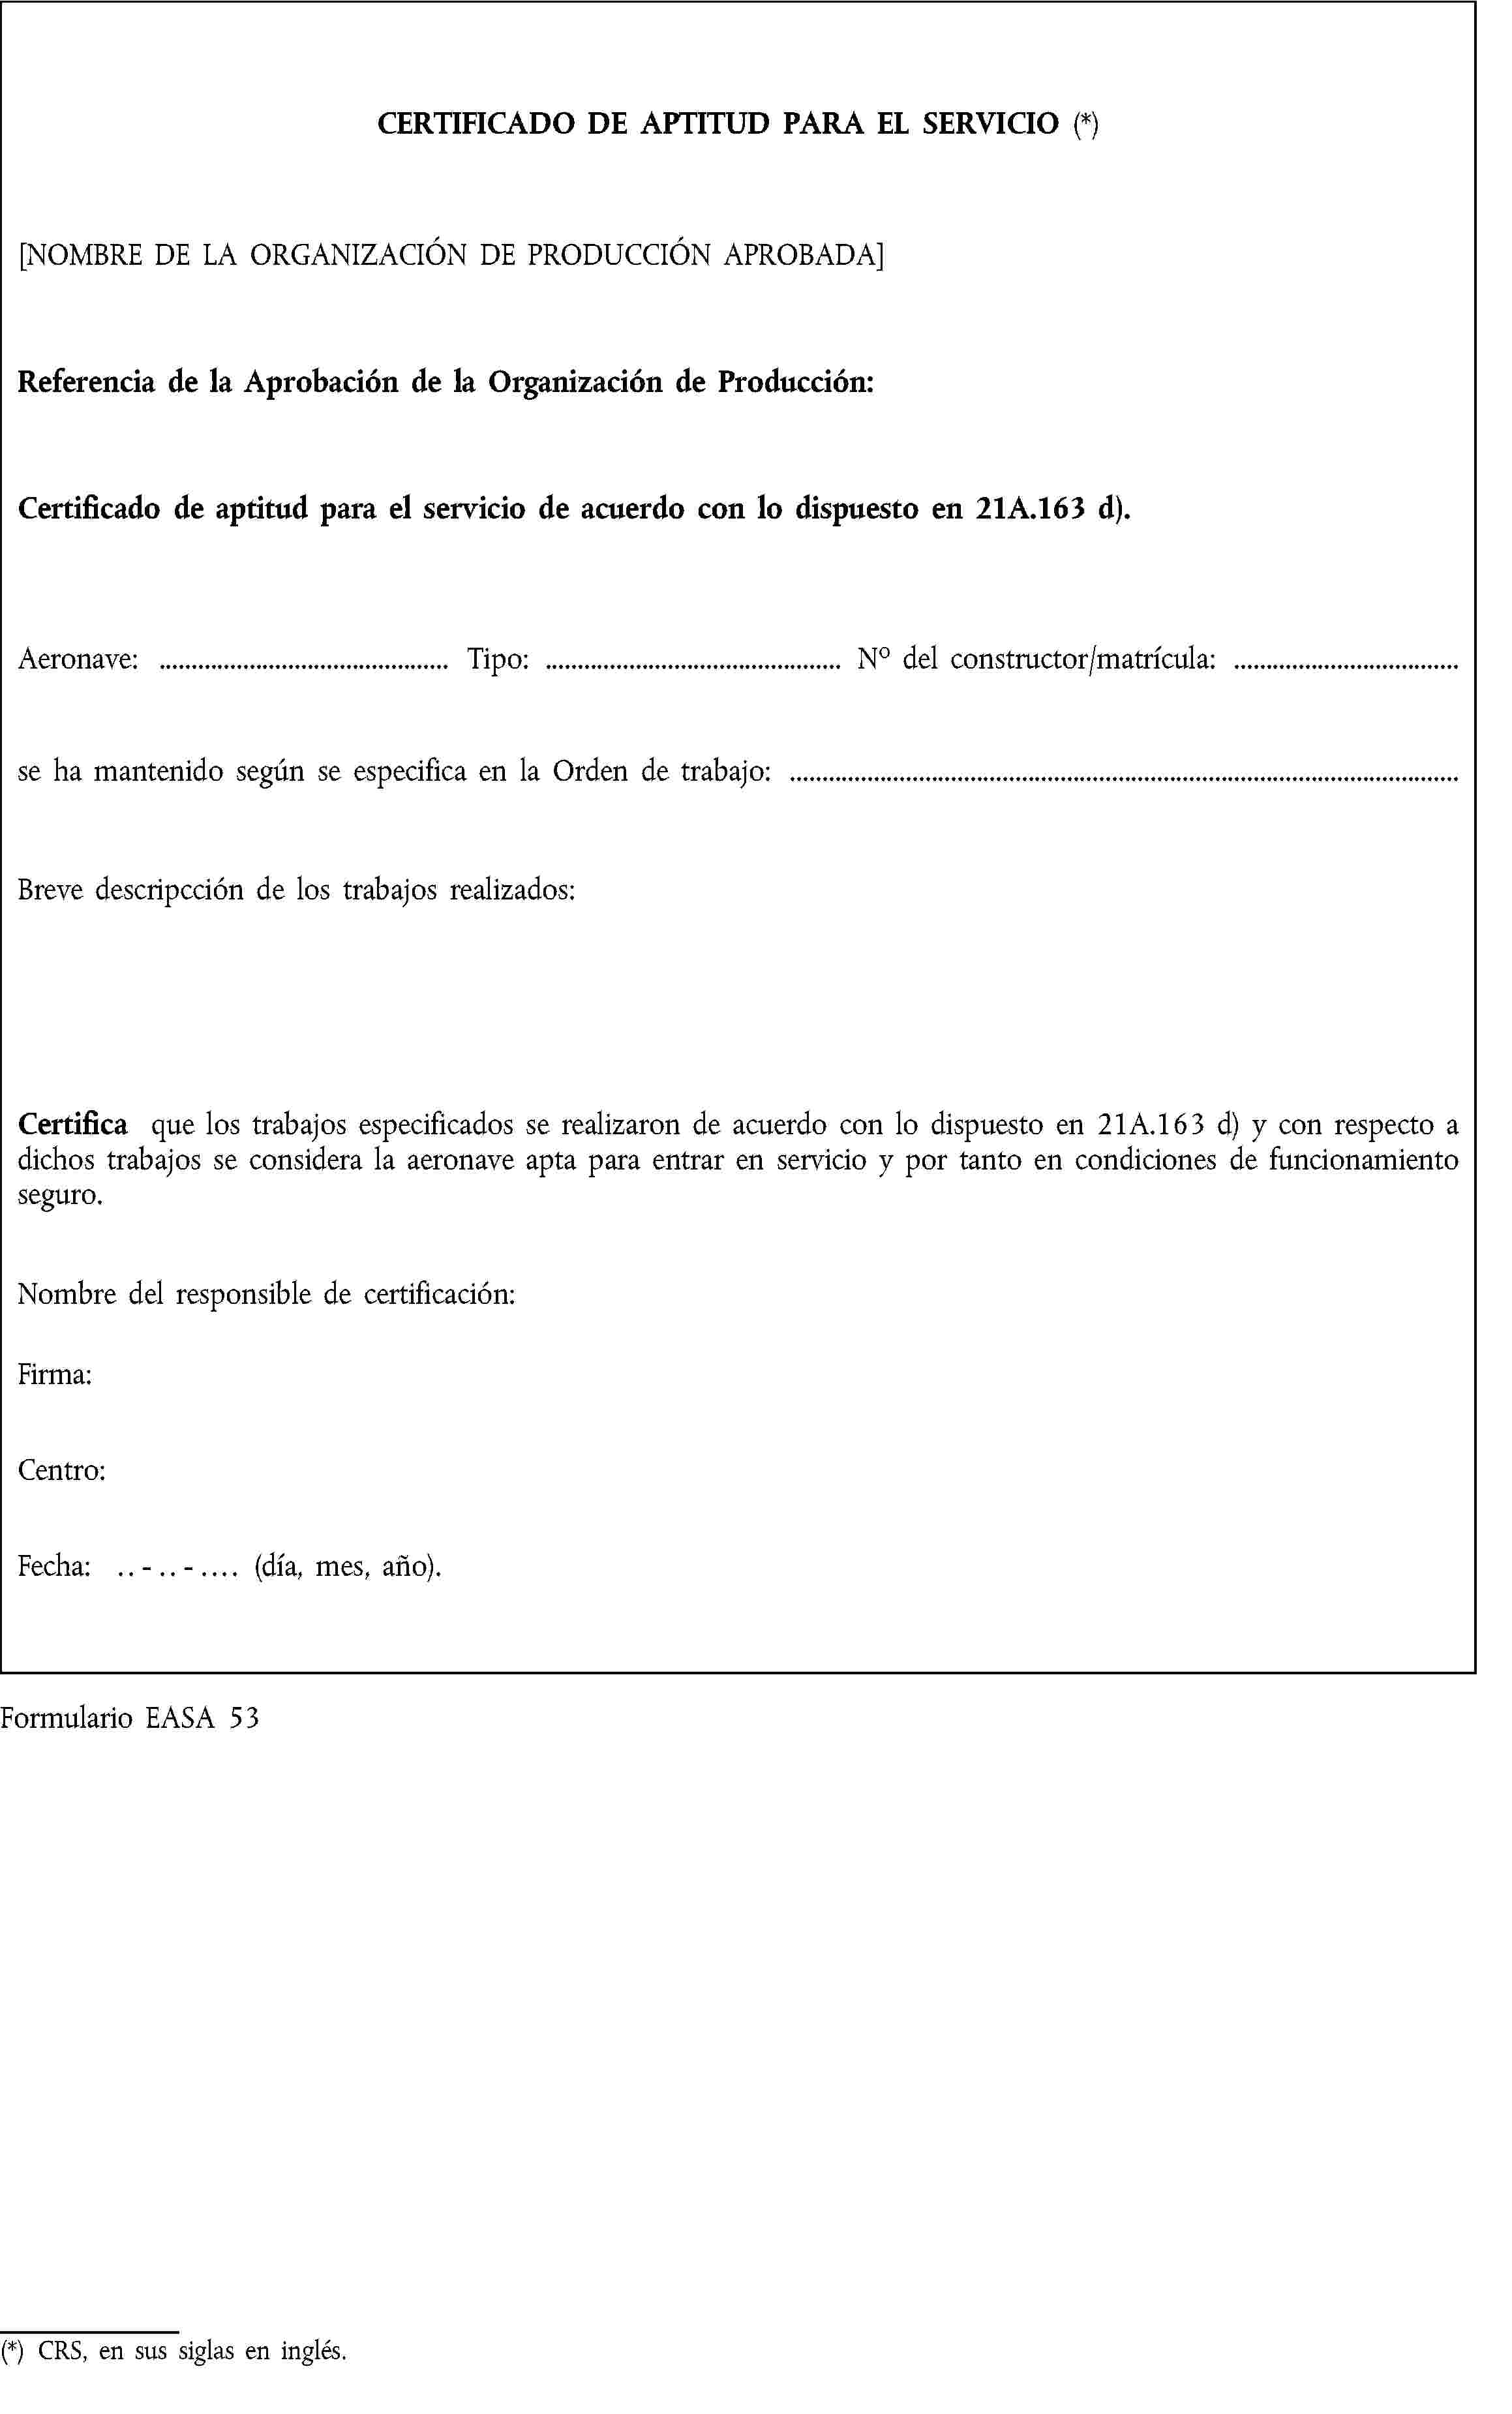 EUR-Lex - 02012R0748-20140217 - EN - EUR-Lex